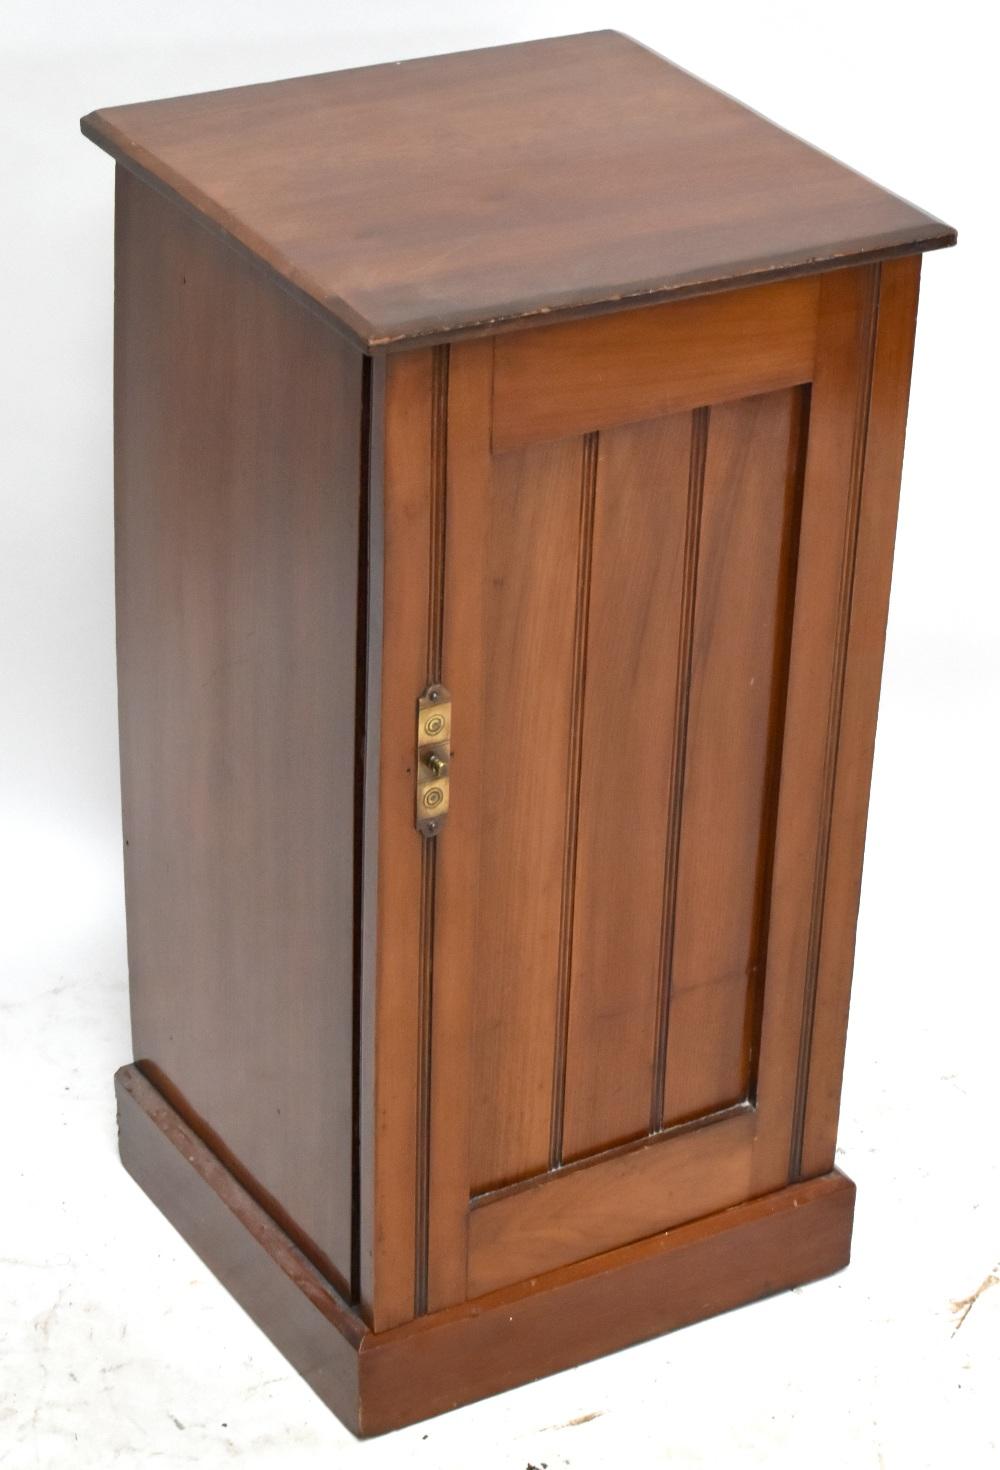 An Edwardian walnut pot cupboard, the single panel door enclosing a fixed shelf, raised on plinth